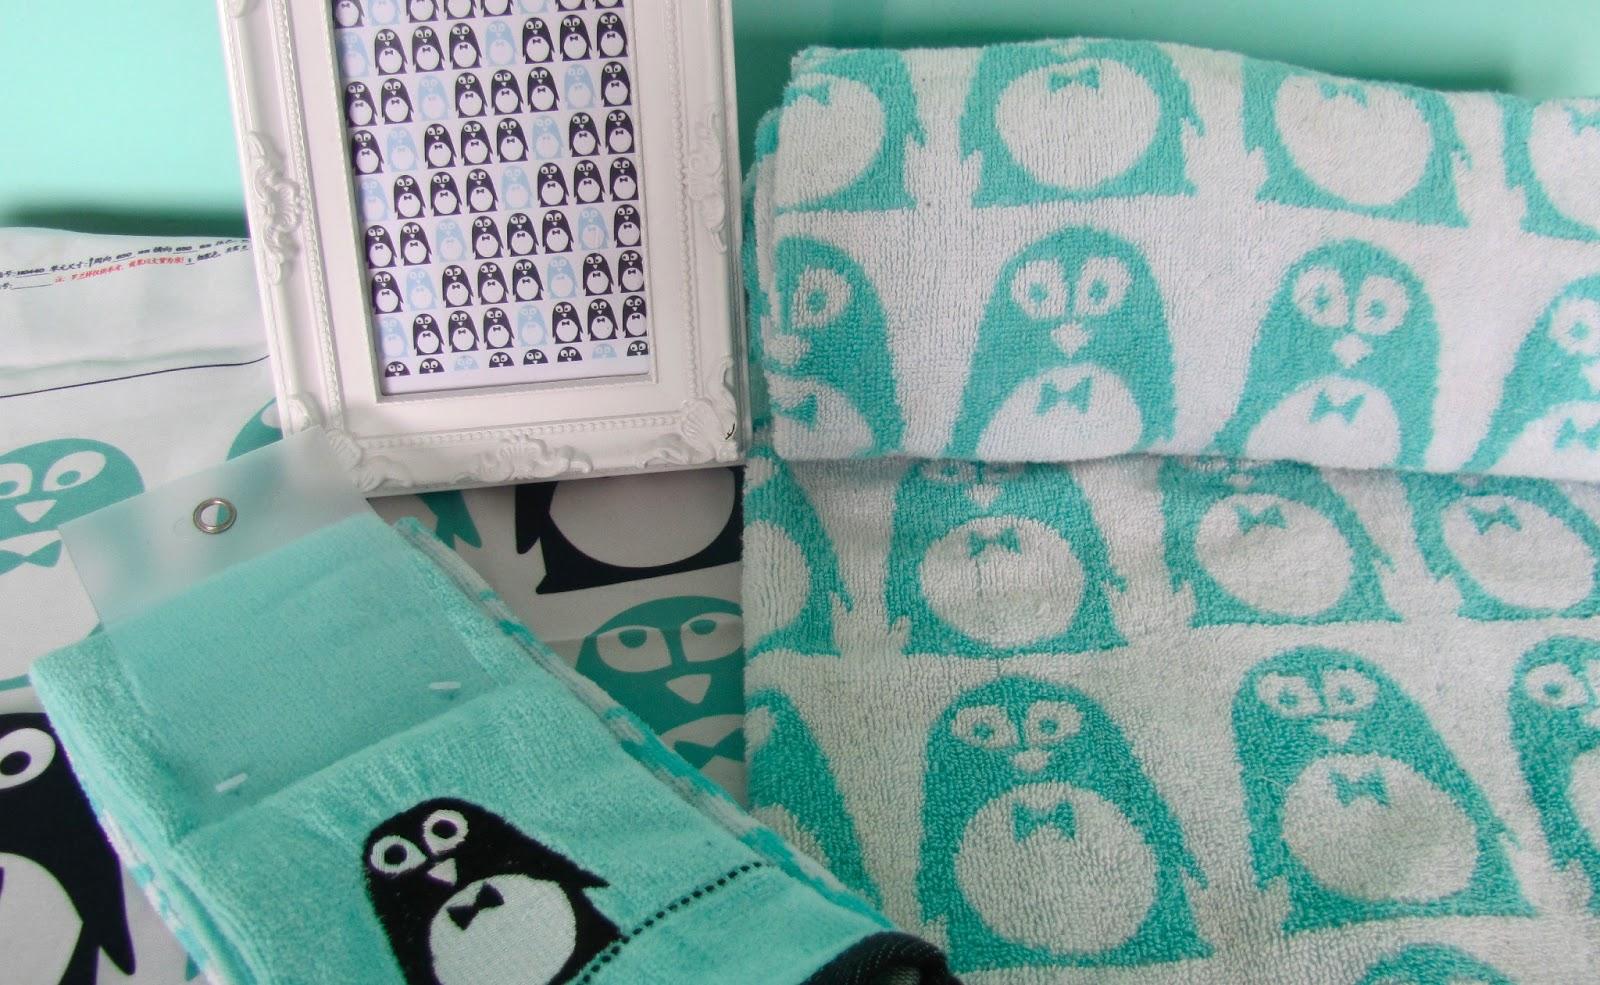 Cortina Baño Infantil:colección baño cortina de polyester toallas de baño y de visita